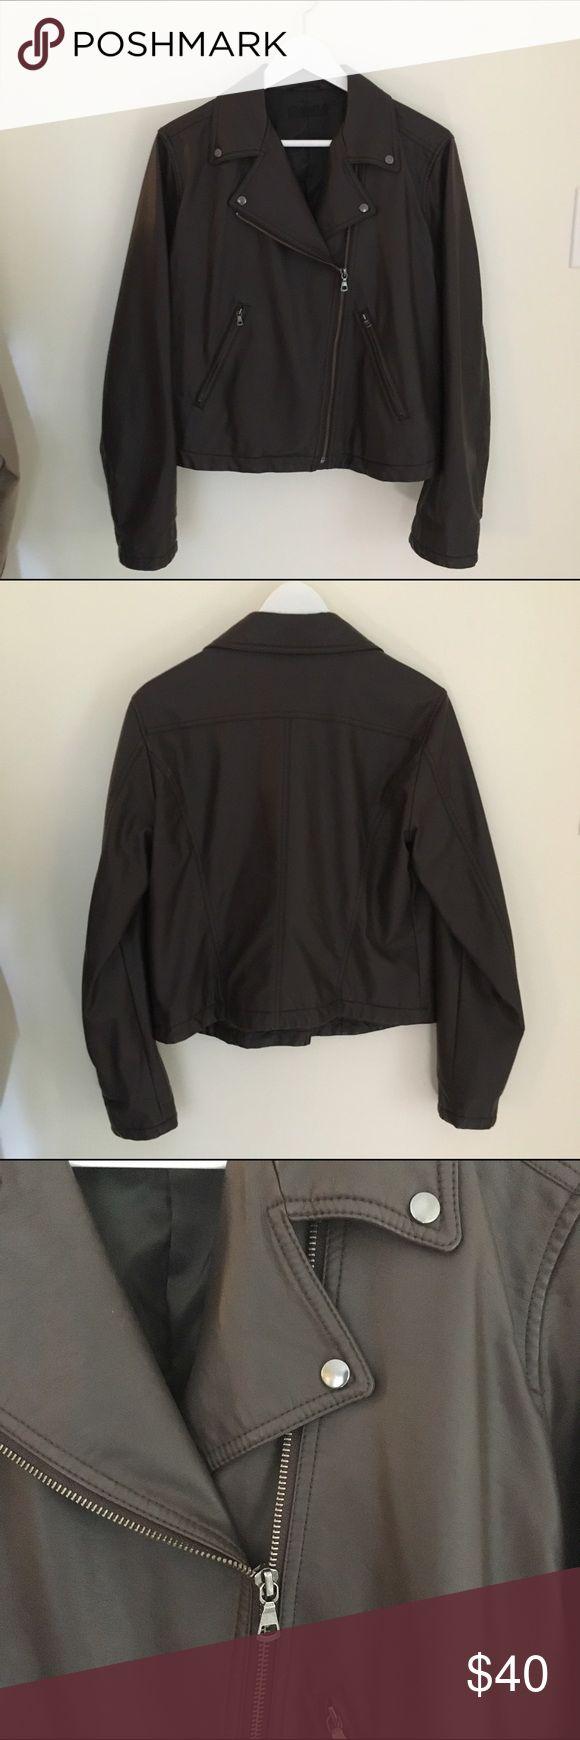 Leather jacket uniqlo - Faux Leather Jacket Uniqlo Dark Brown Imitation Leather Shell Polyester Lining Good